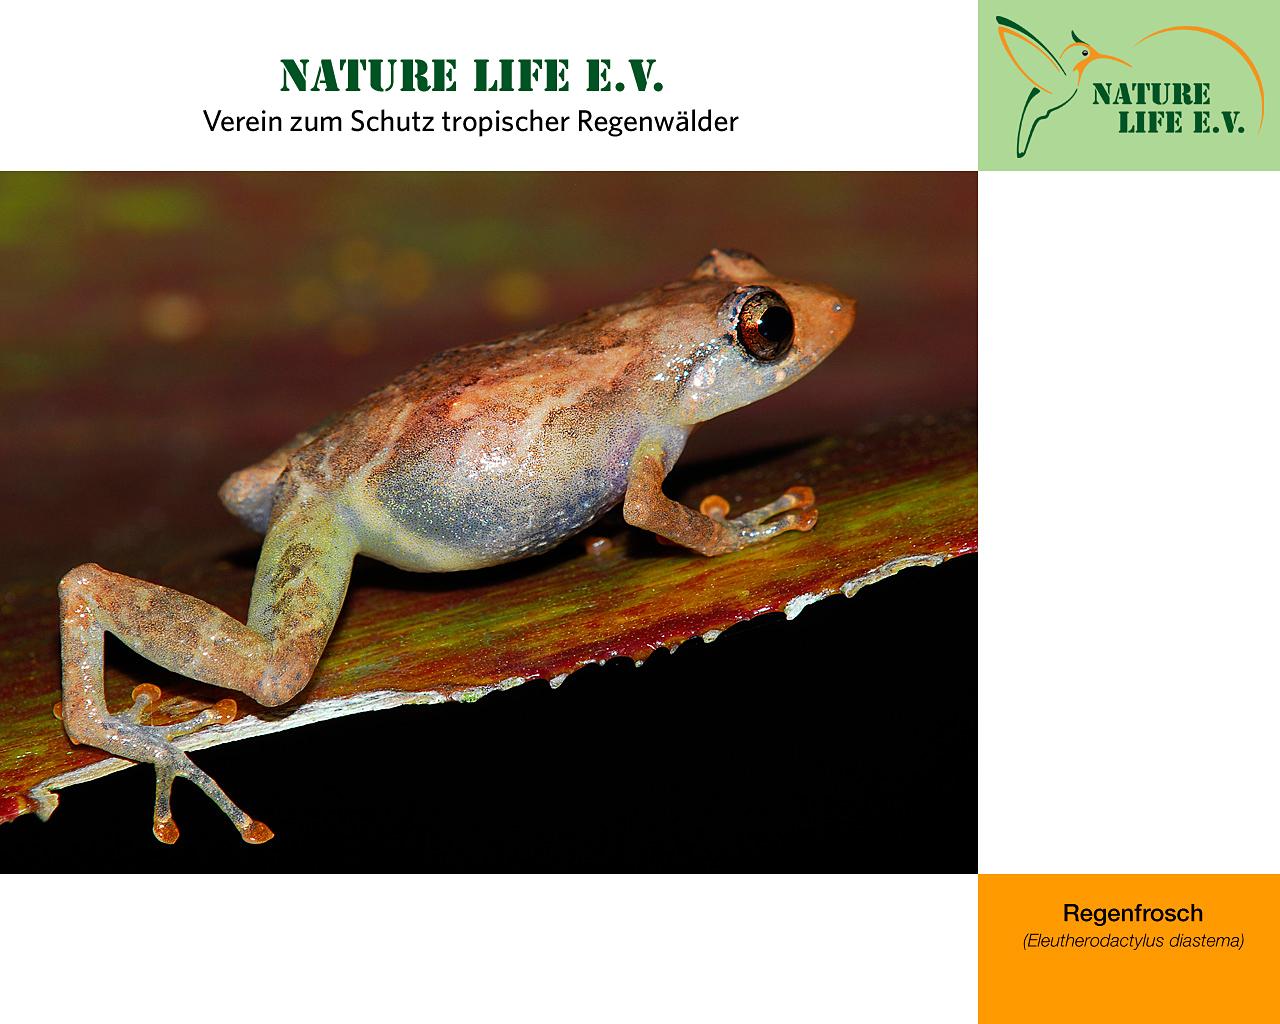 Regenfrosch (Eleutherodactylus diastema) 1280 x 1024